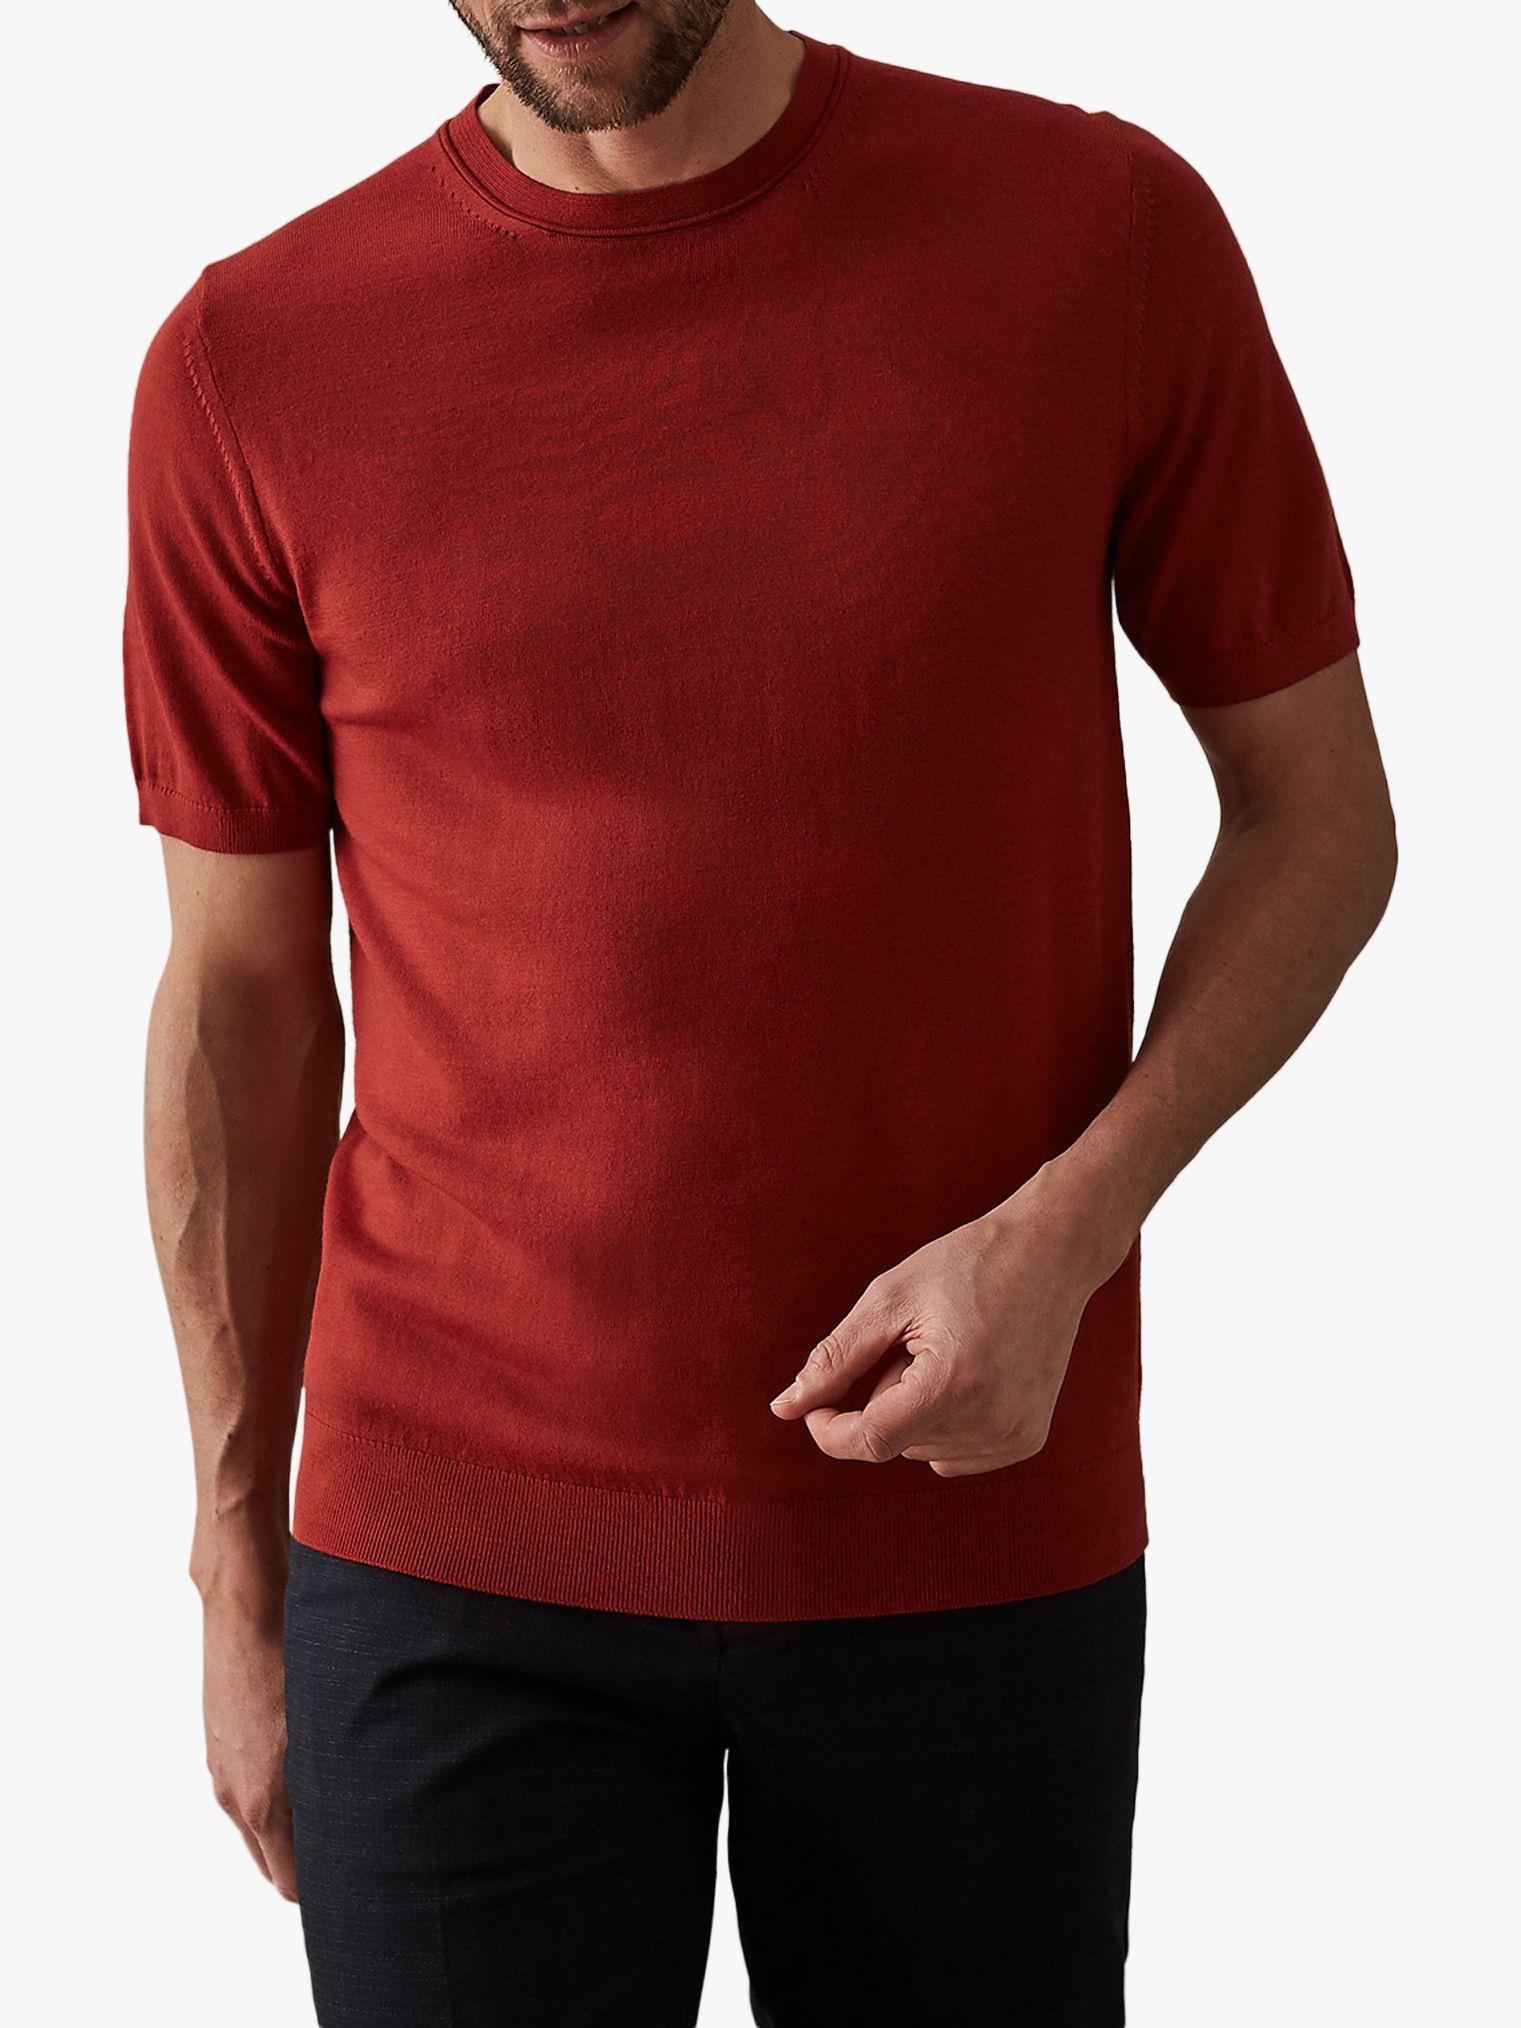 9ac553954d1 Reiss Wiltshire Merino Short Sleeve Jumper in Red for Men - Lyst